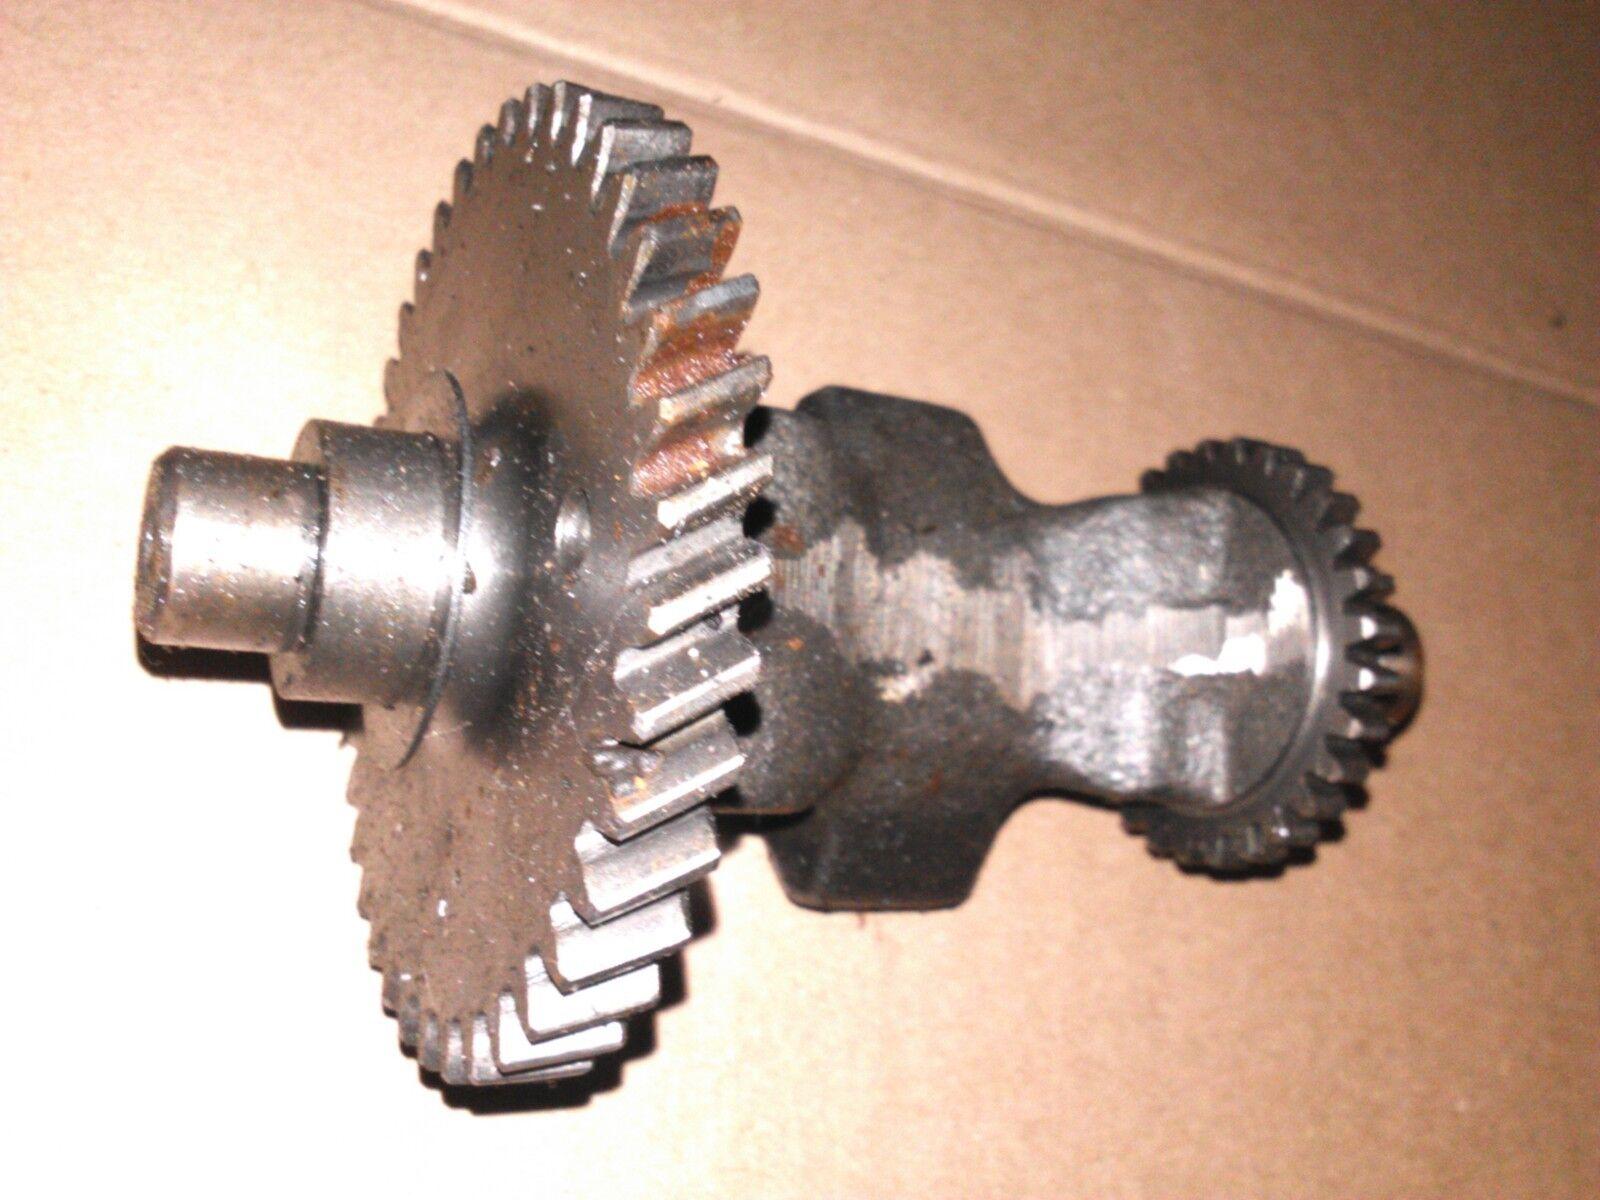 USED 2462410223 Balancer Shaft FOR G6100R & MORE-